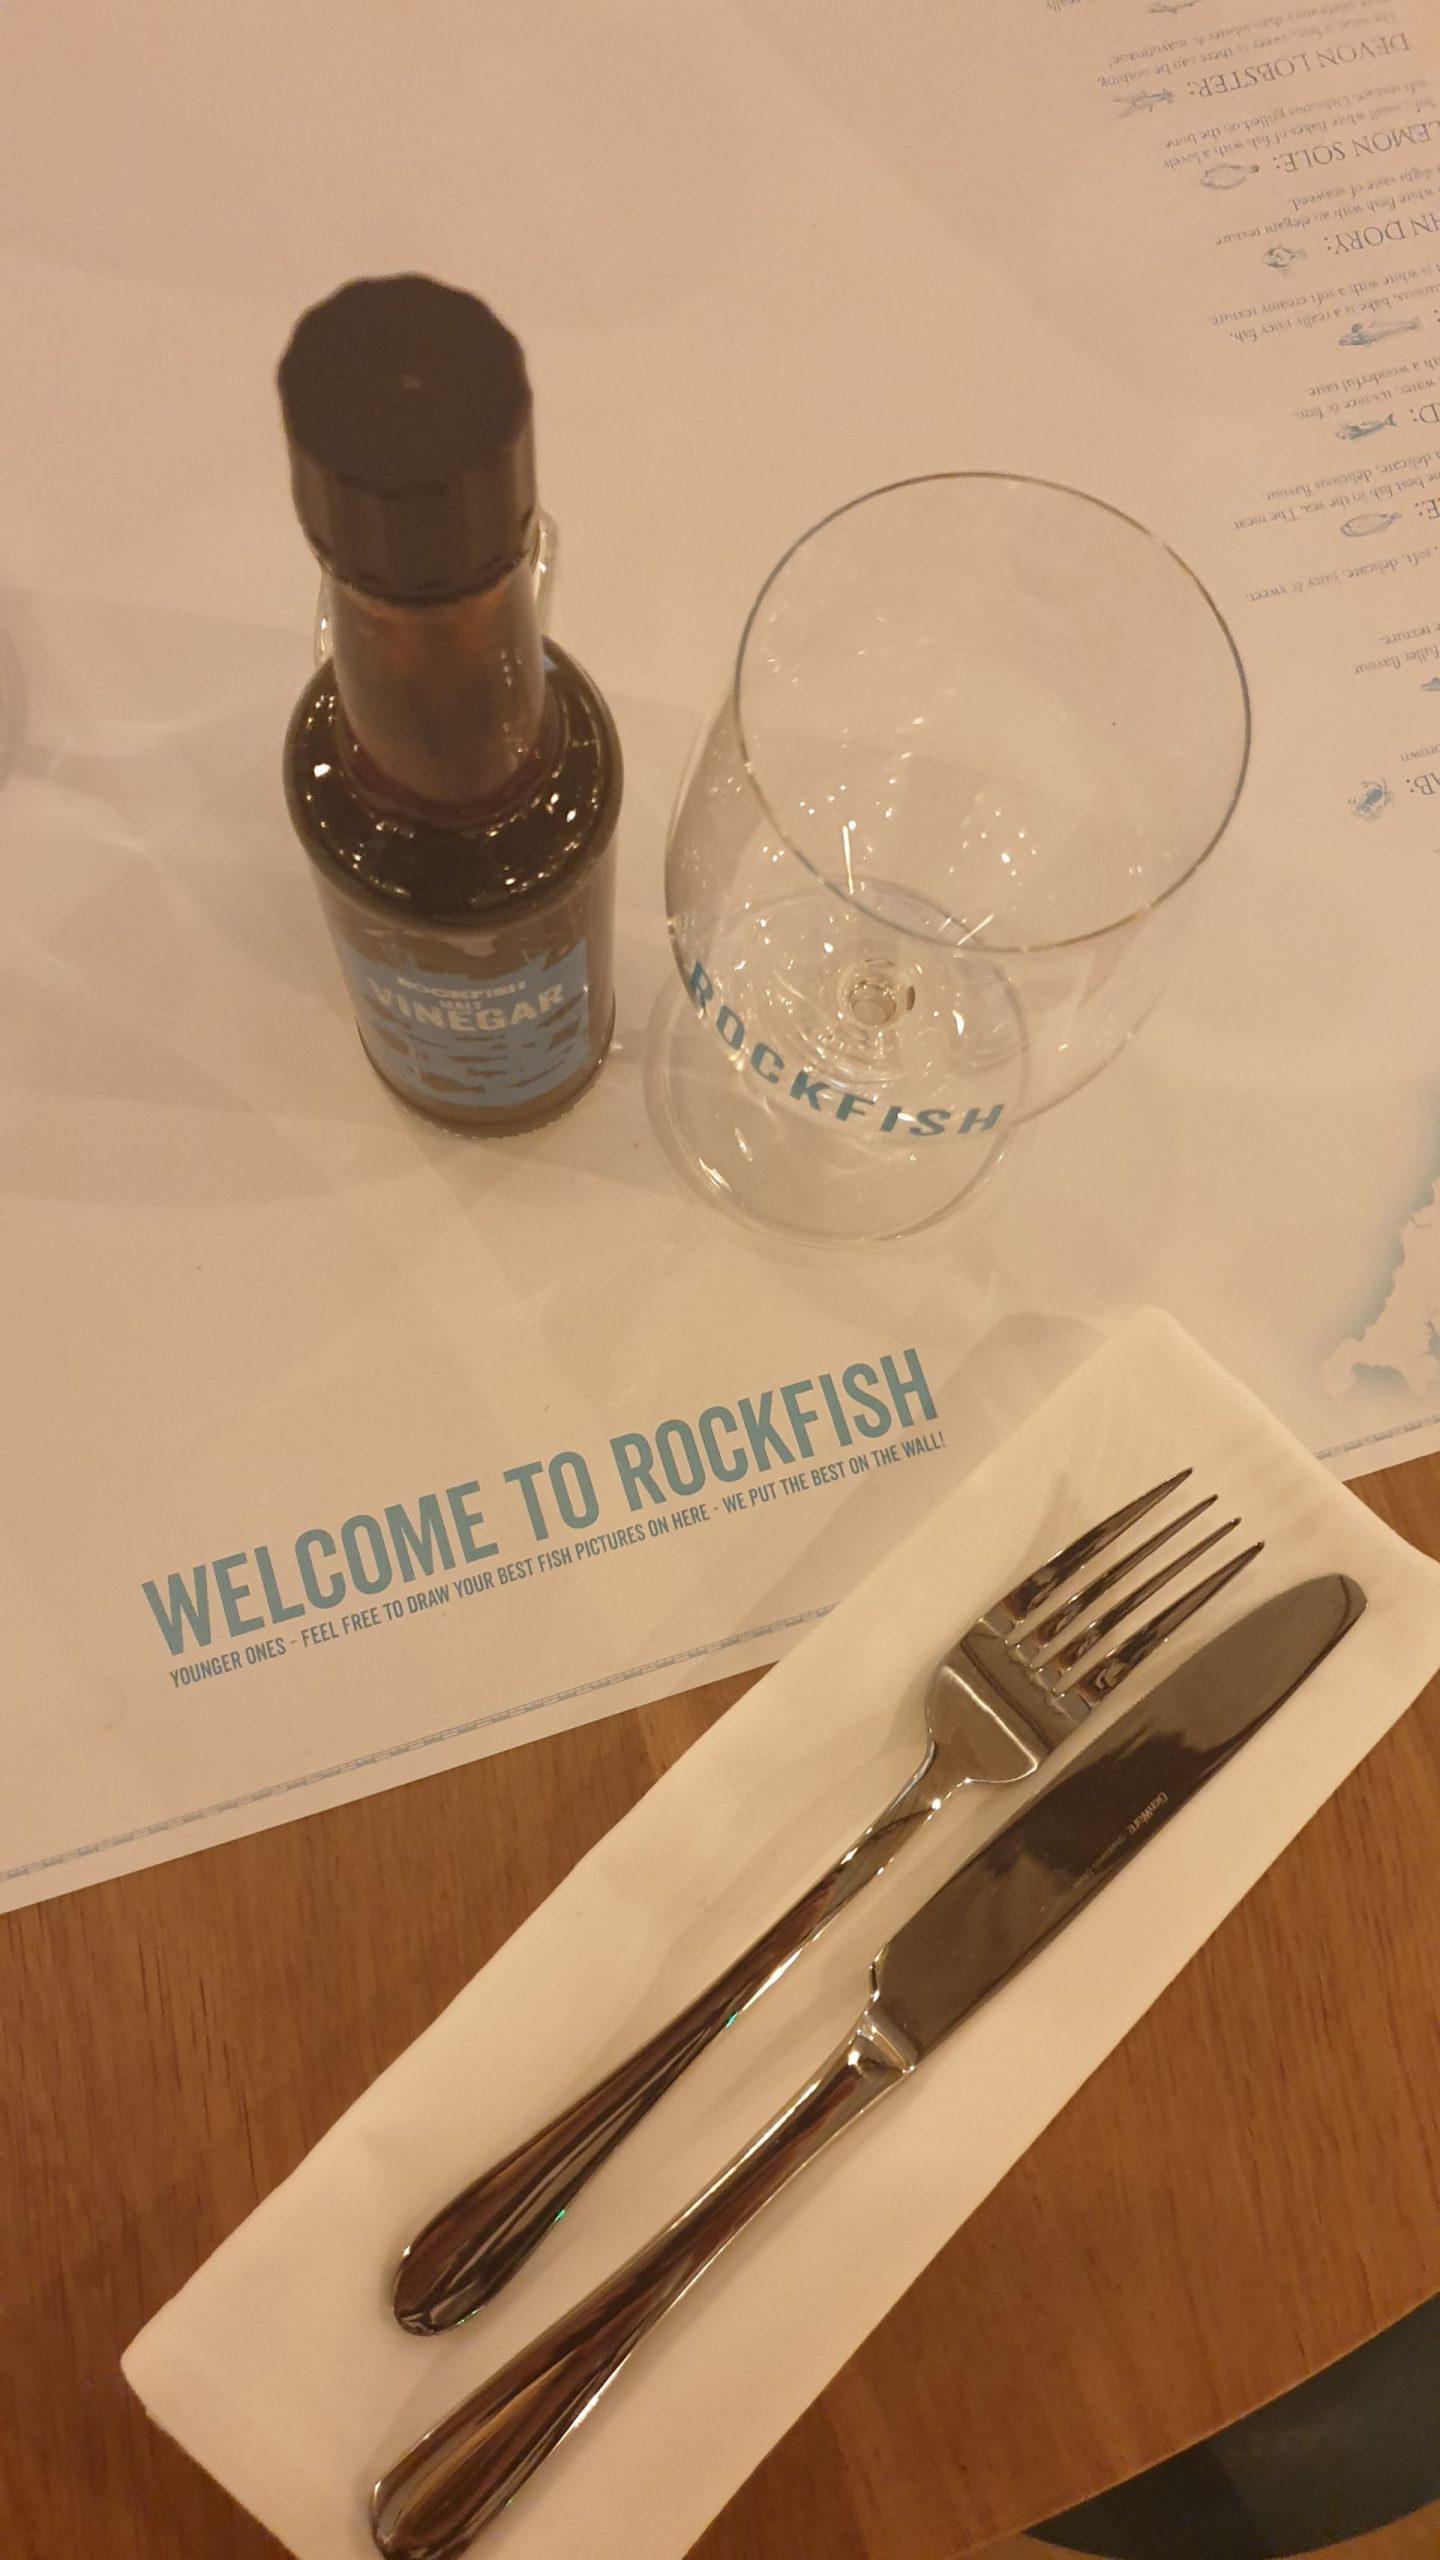 Rockfish branding